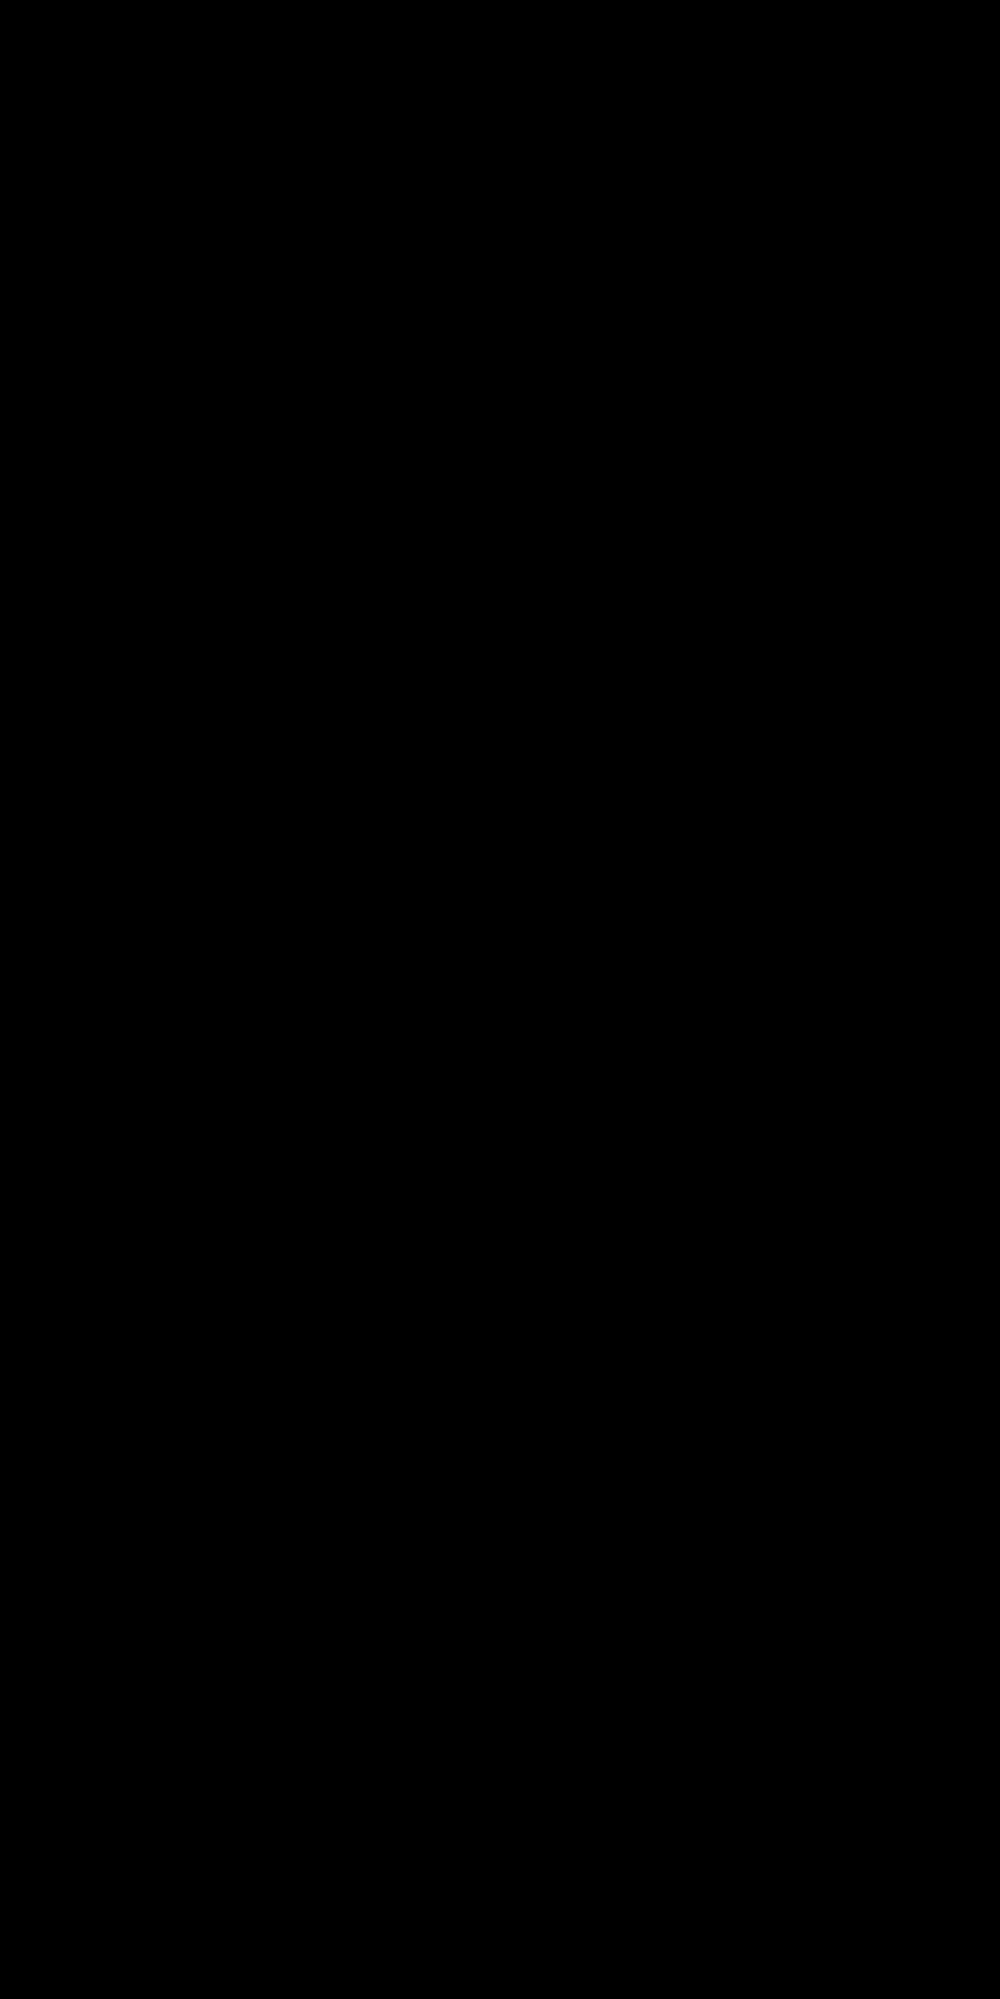 Leaf_in_box_Black